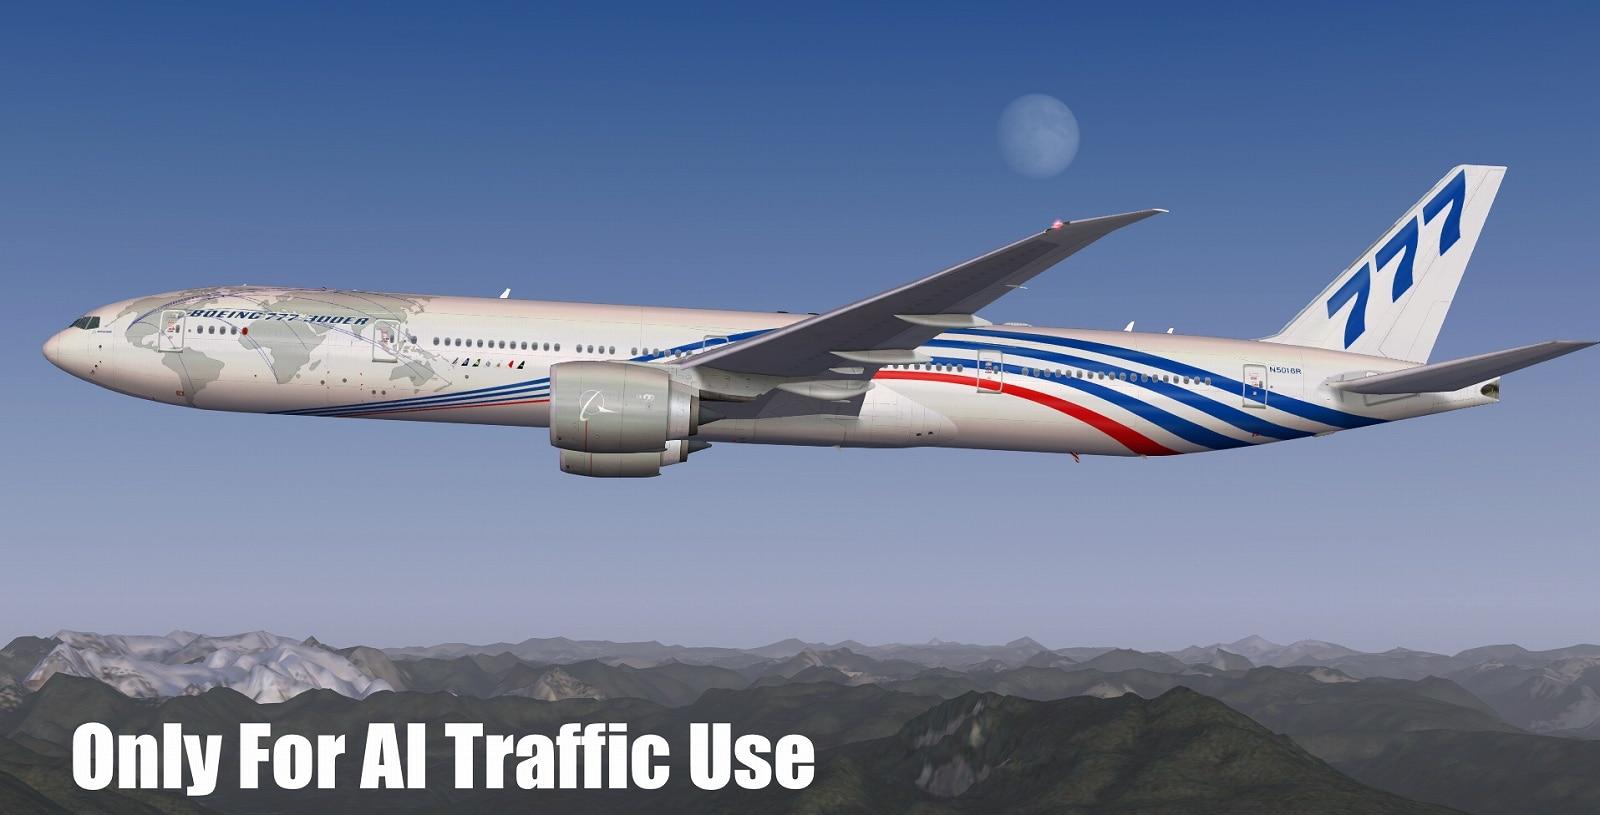 P3d Ai Traffic